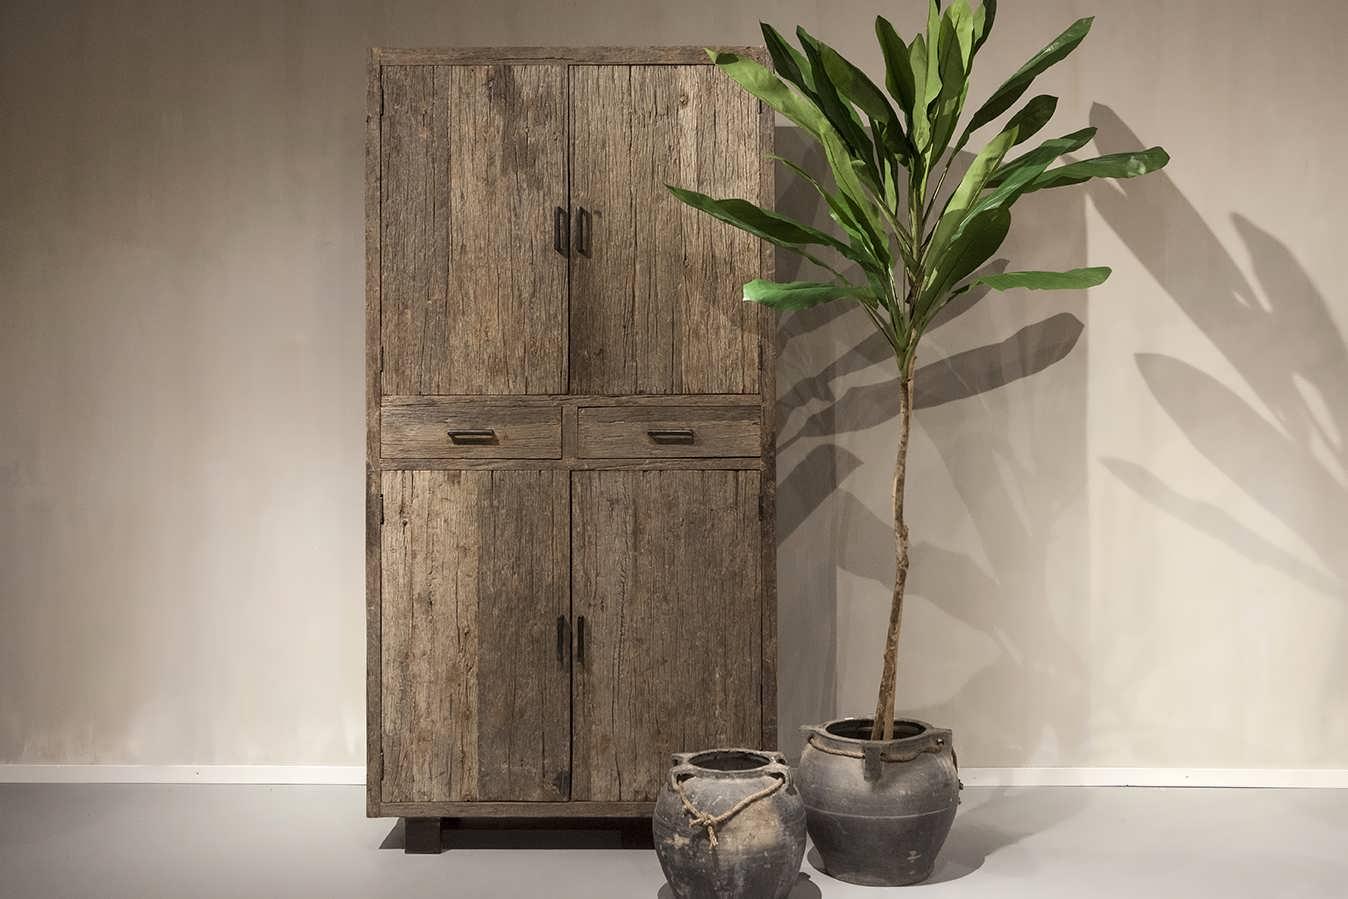 Design Hoge Kast : Kast van oud hout bailar direct uit voorraad robuustetafels.nl